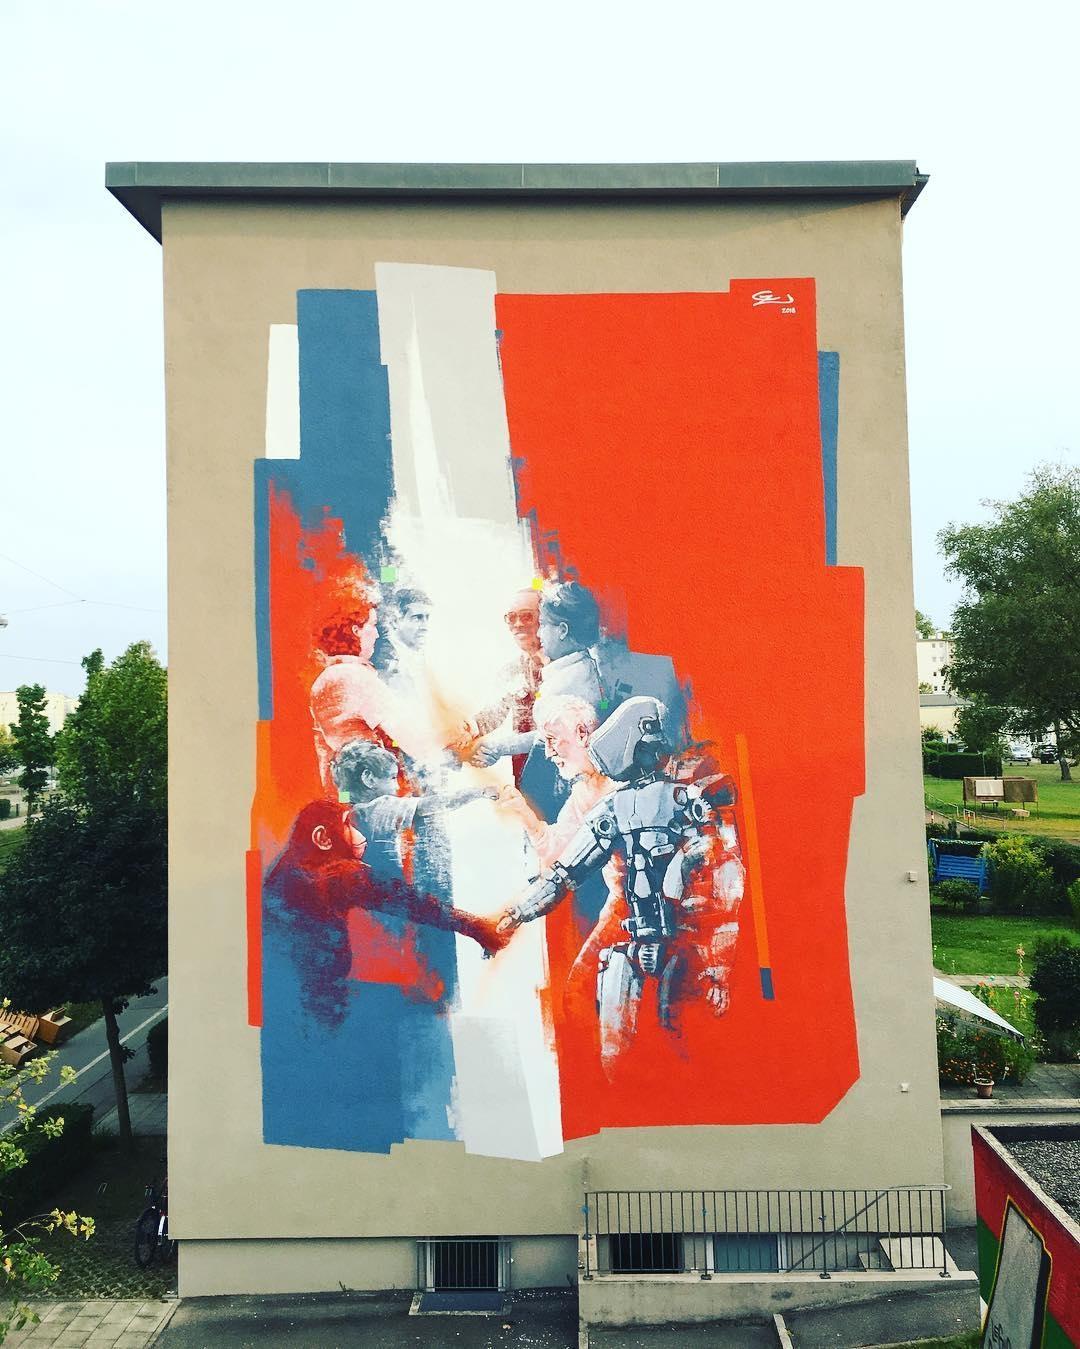 Guido Zimmermann @Augsburg, Germany